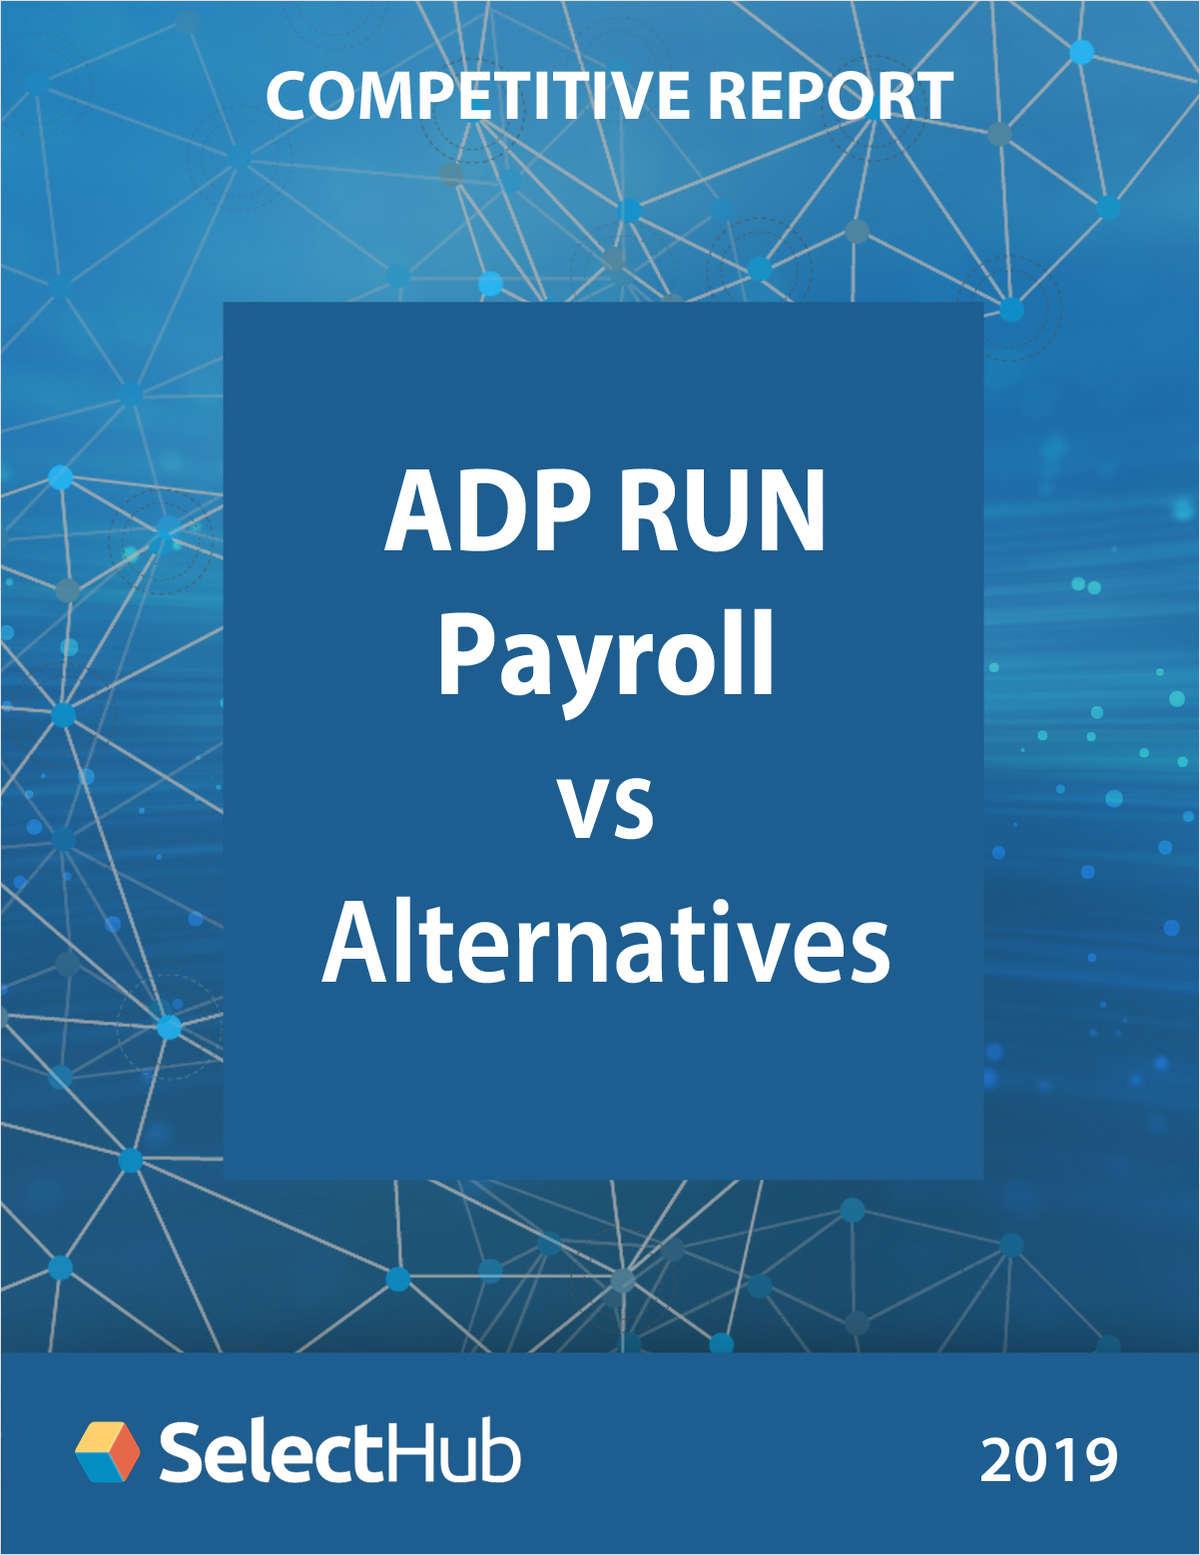 ADP RUN Payroll vs. Best Alternatives - Competitive Report